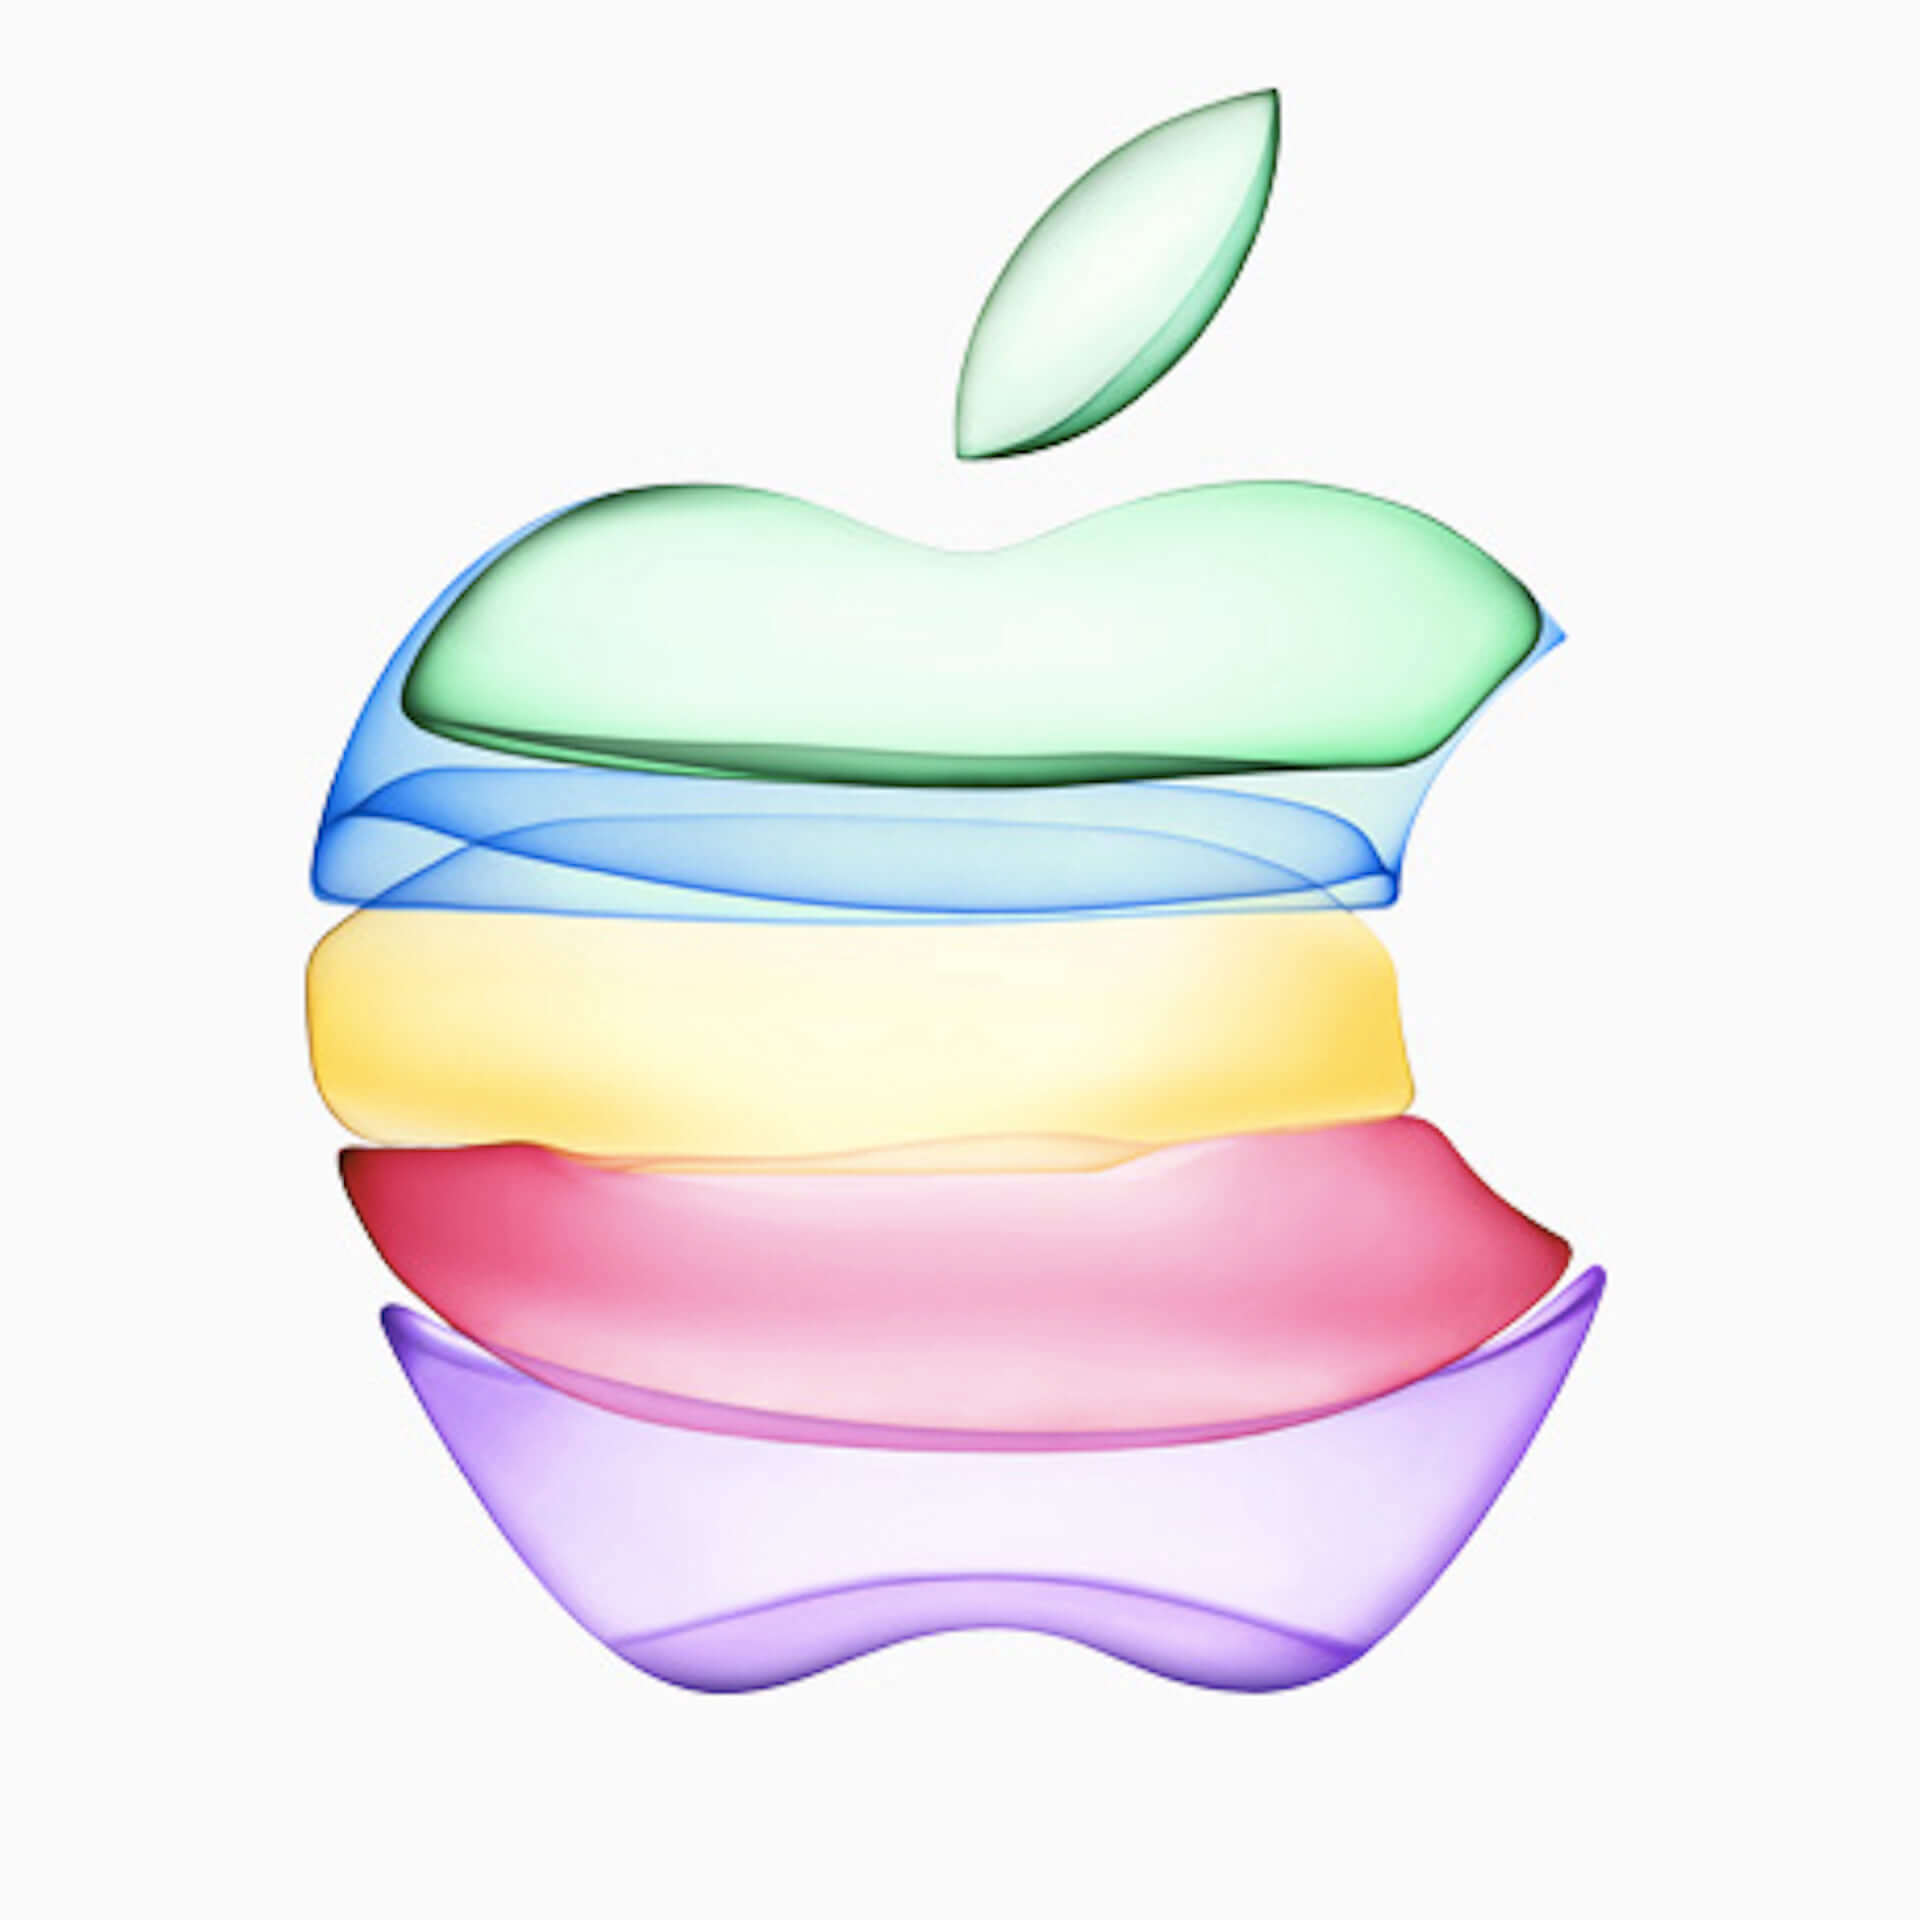 Apple公式イベントで発表の新型iPhone、「iPhone 11」に決定か 発売日も同時に判明? tech190905_apple_iphone11_main-1920x1920